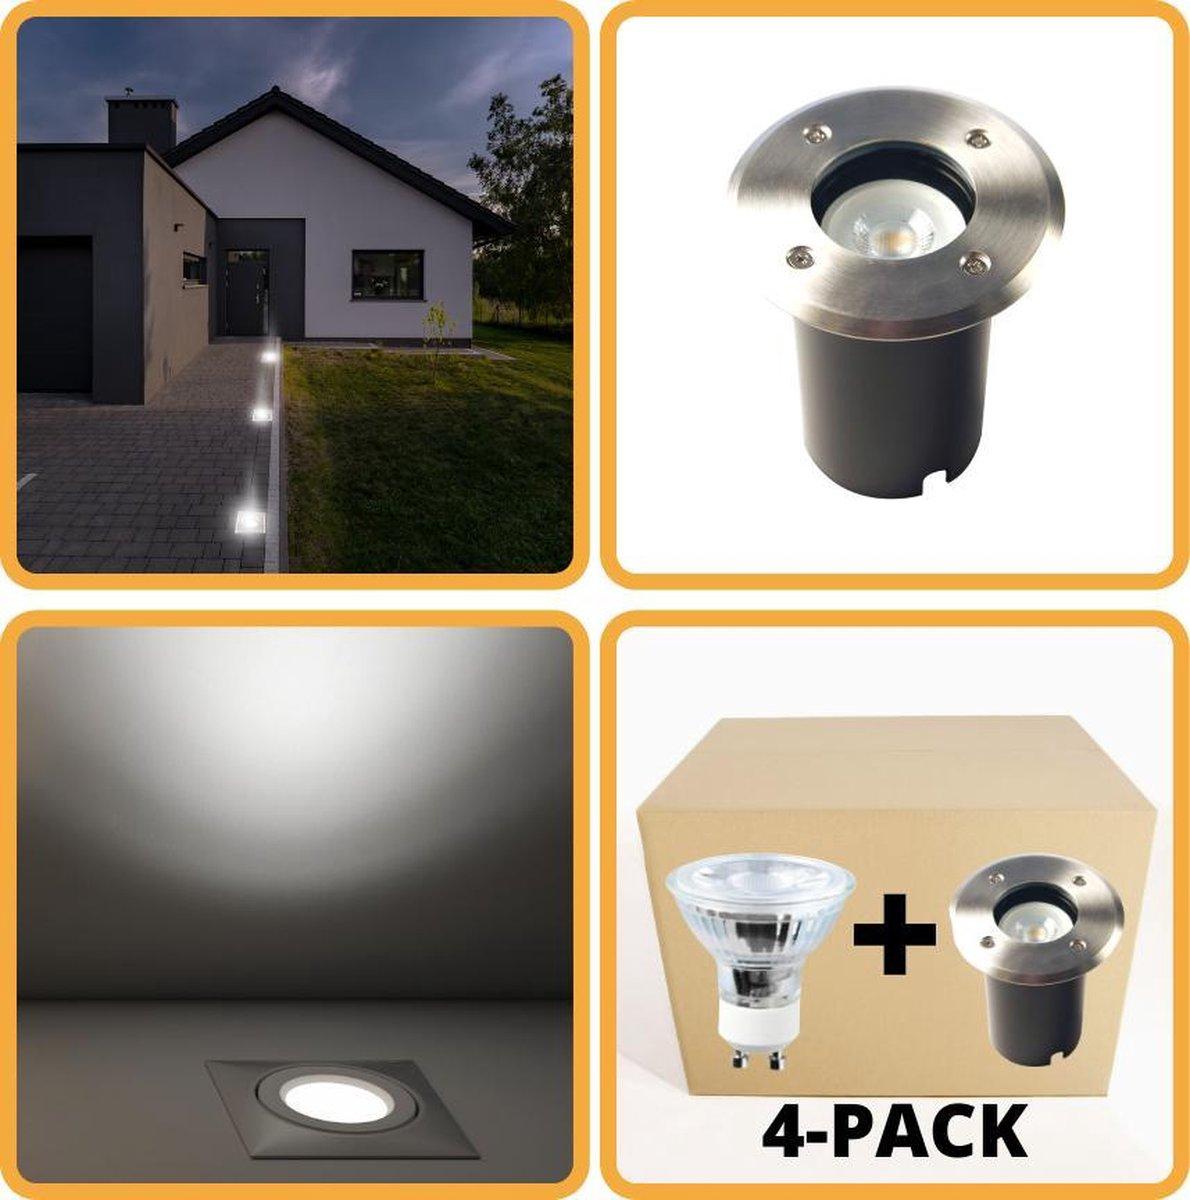 Proventa HeavyDuty LED Grondspots IP67 - Rond - 4 x inbouw tuinspots buiten - koud wit